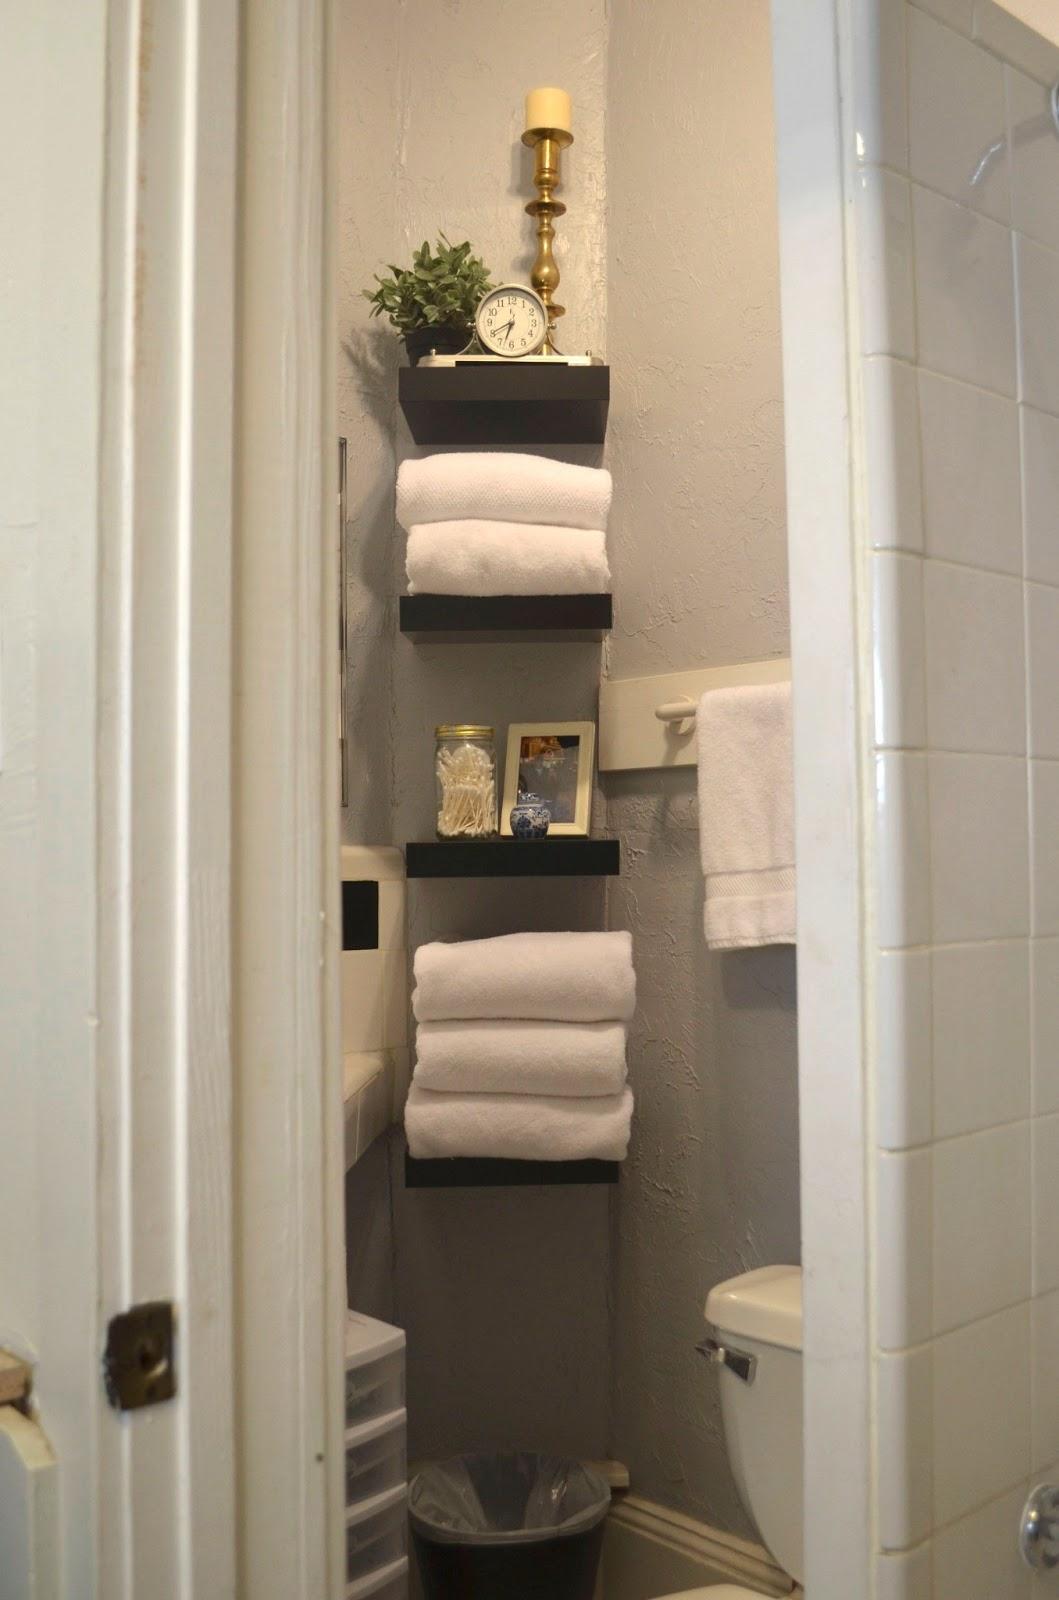 Bathroom Shower Racks   what to wear with khaki pants